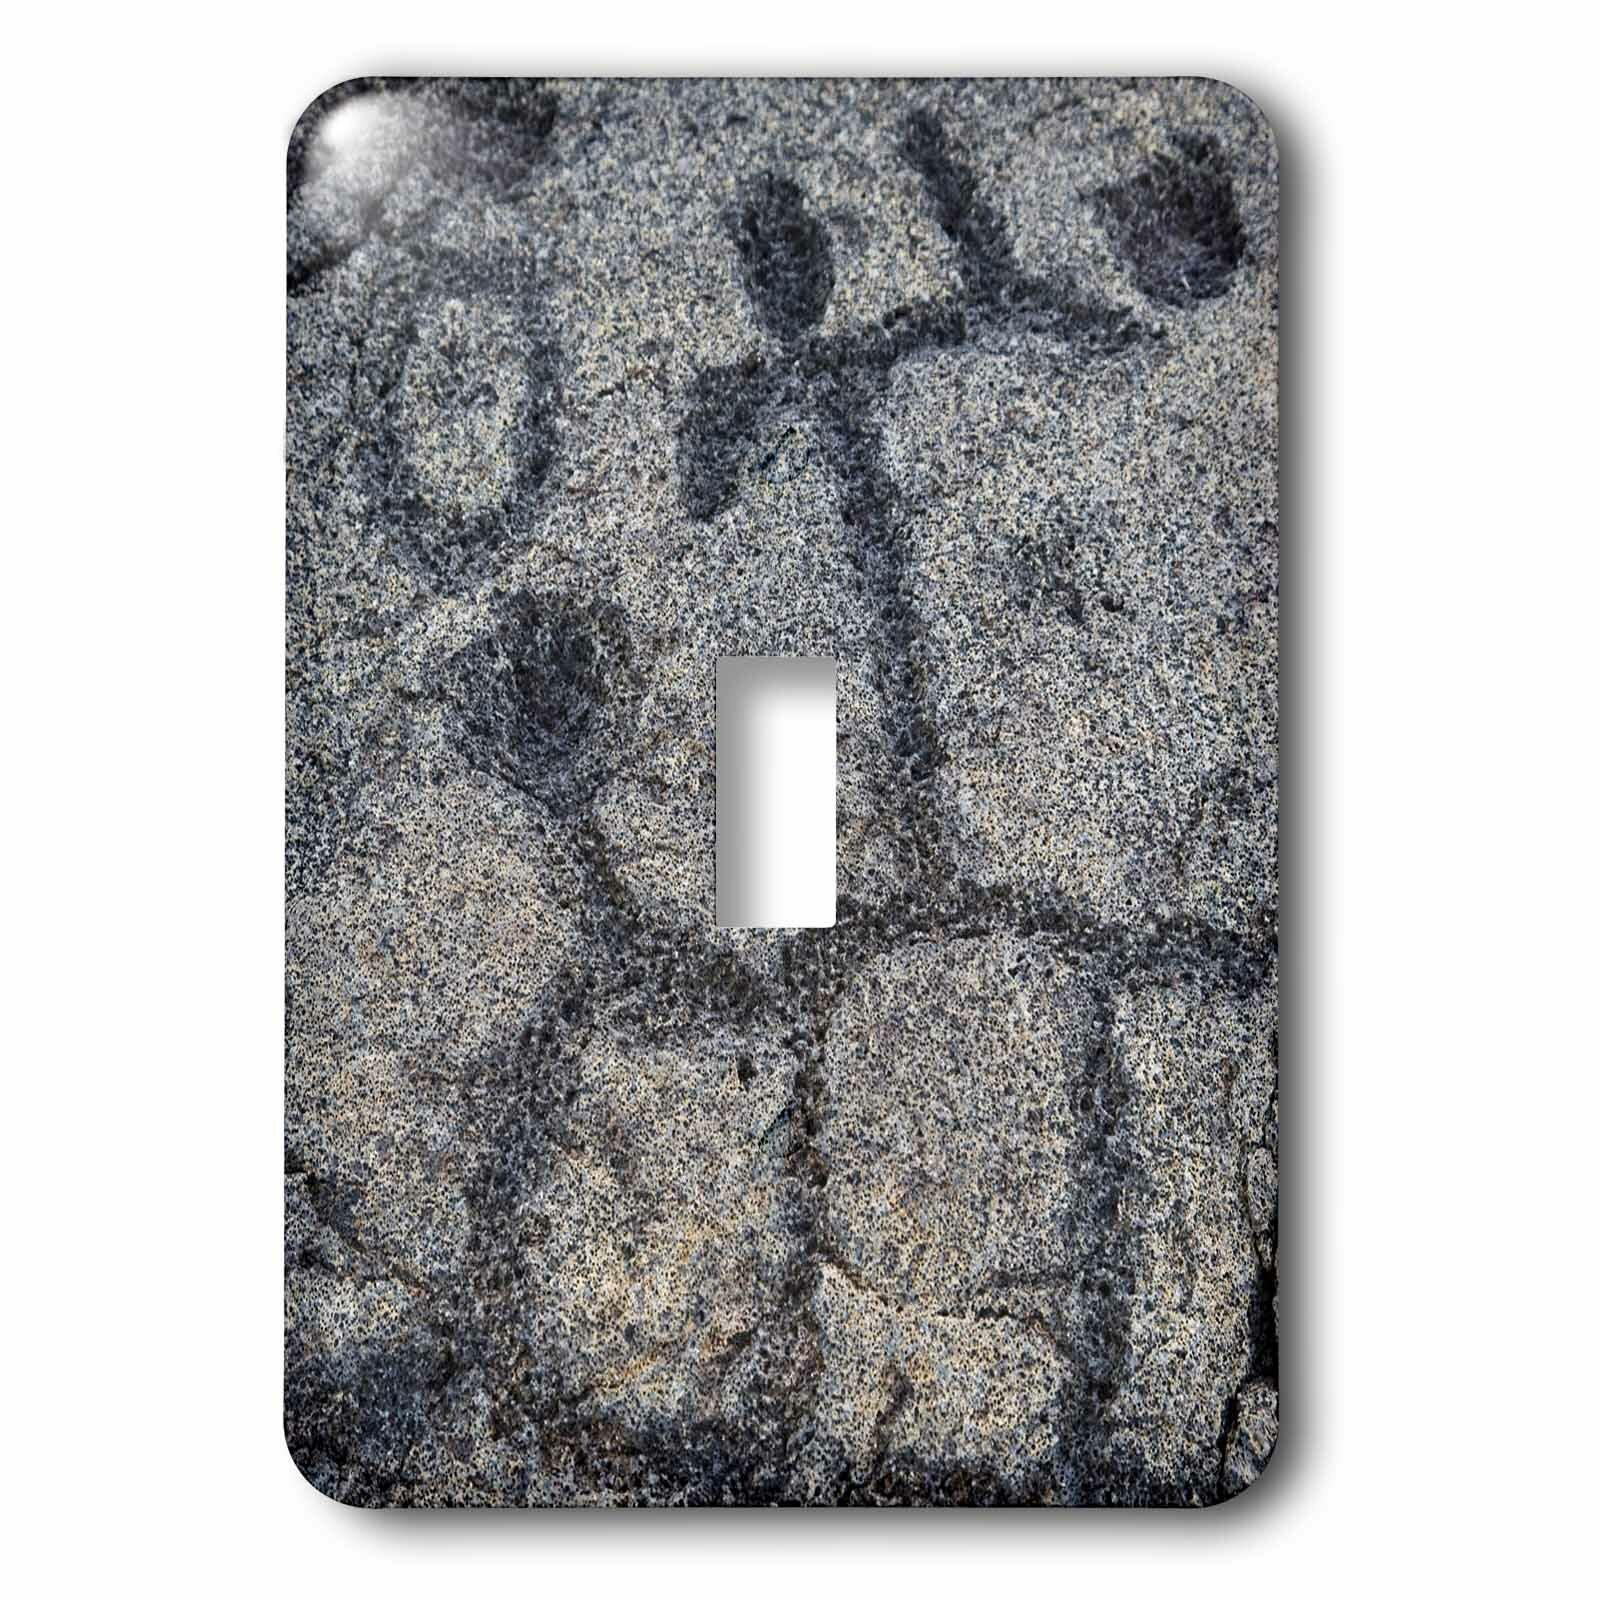 3drose Petroglyph Volcanoes Np Big Island Hawaii 1 Gang Toggle Light Switch Wall Plate Wayfair